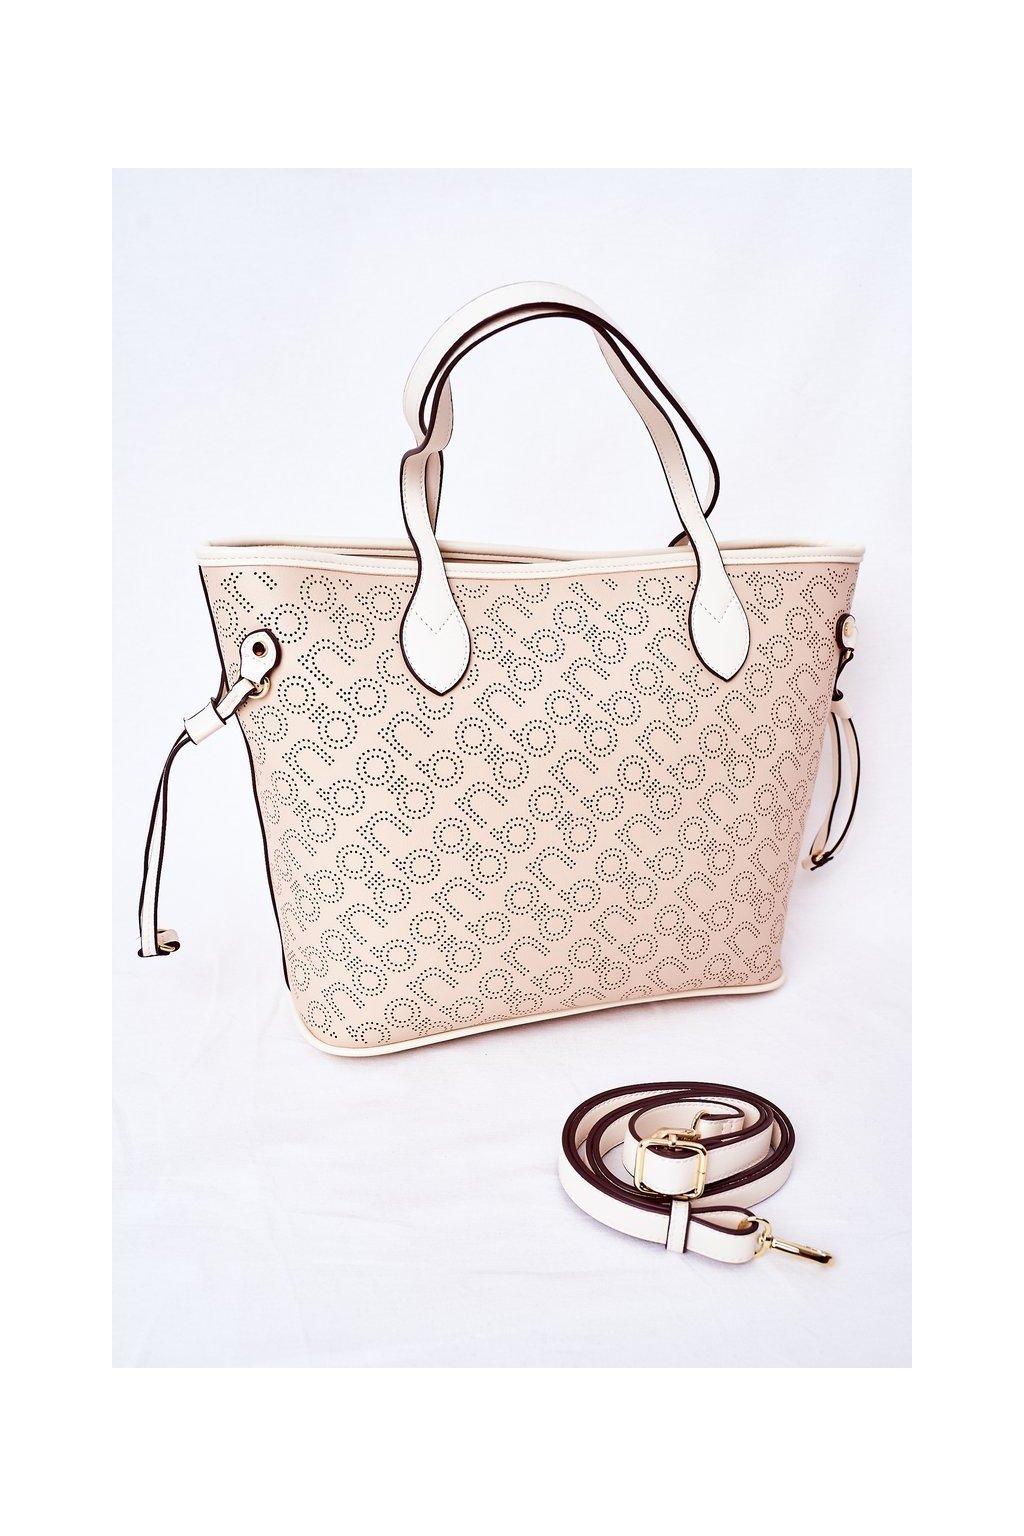 Dámska kabelka hnedá kód kabelky NBAG-K3160-C015 BEIGE